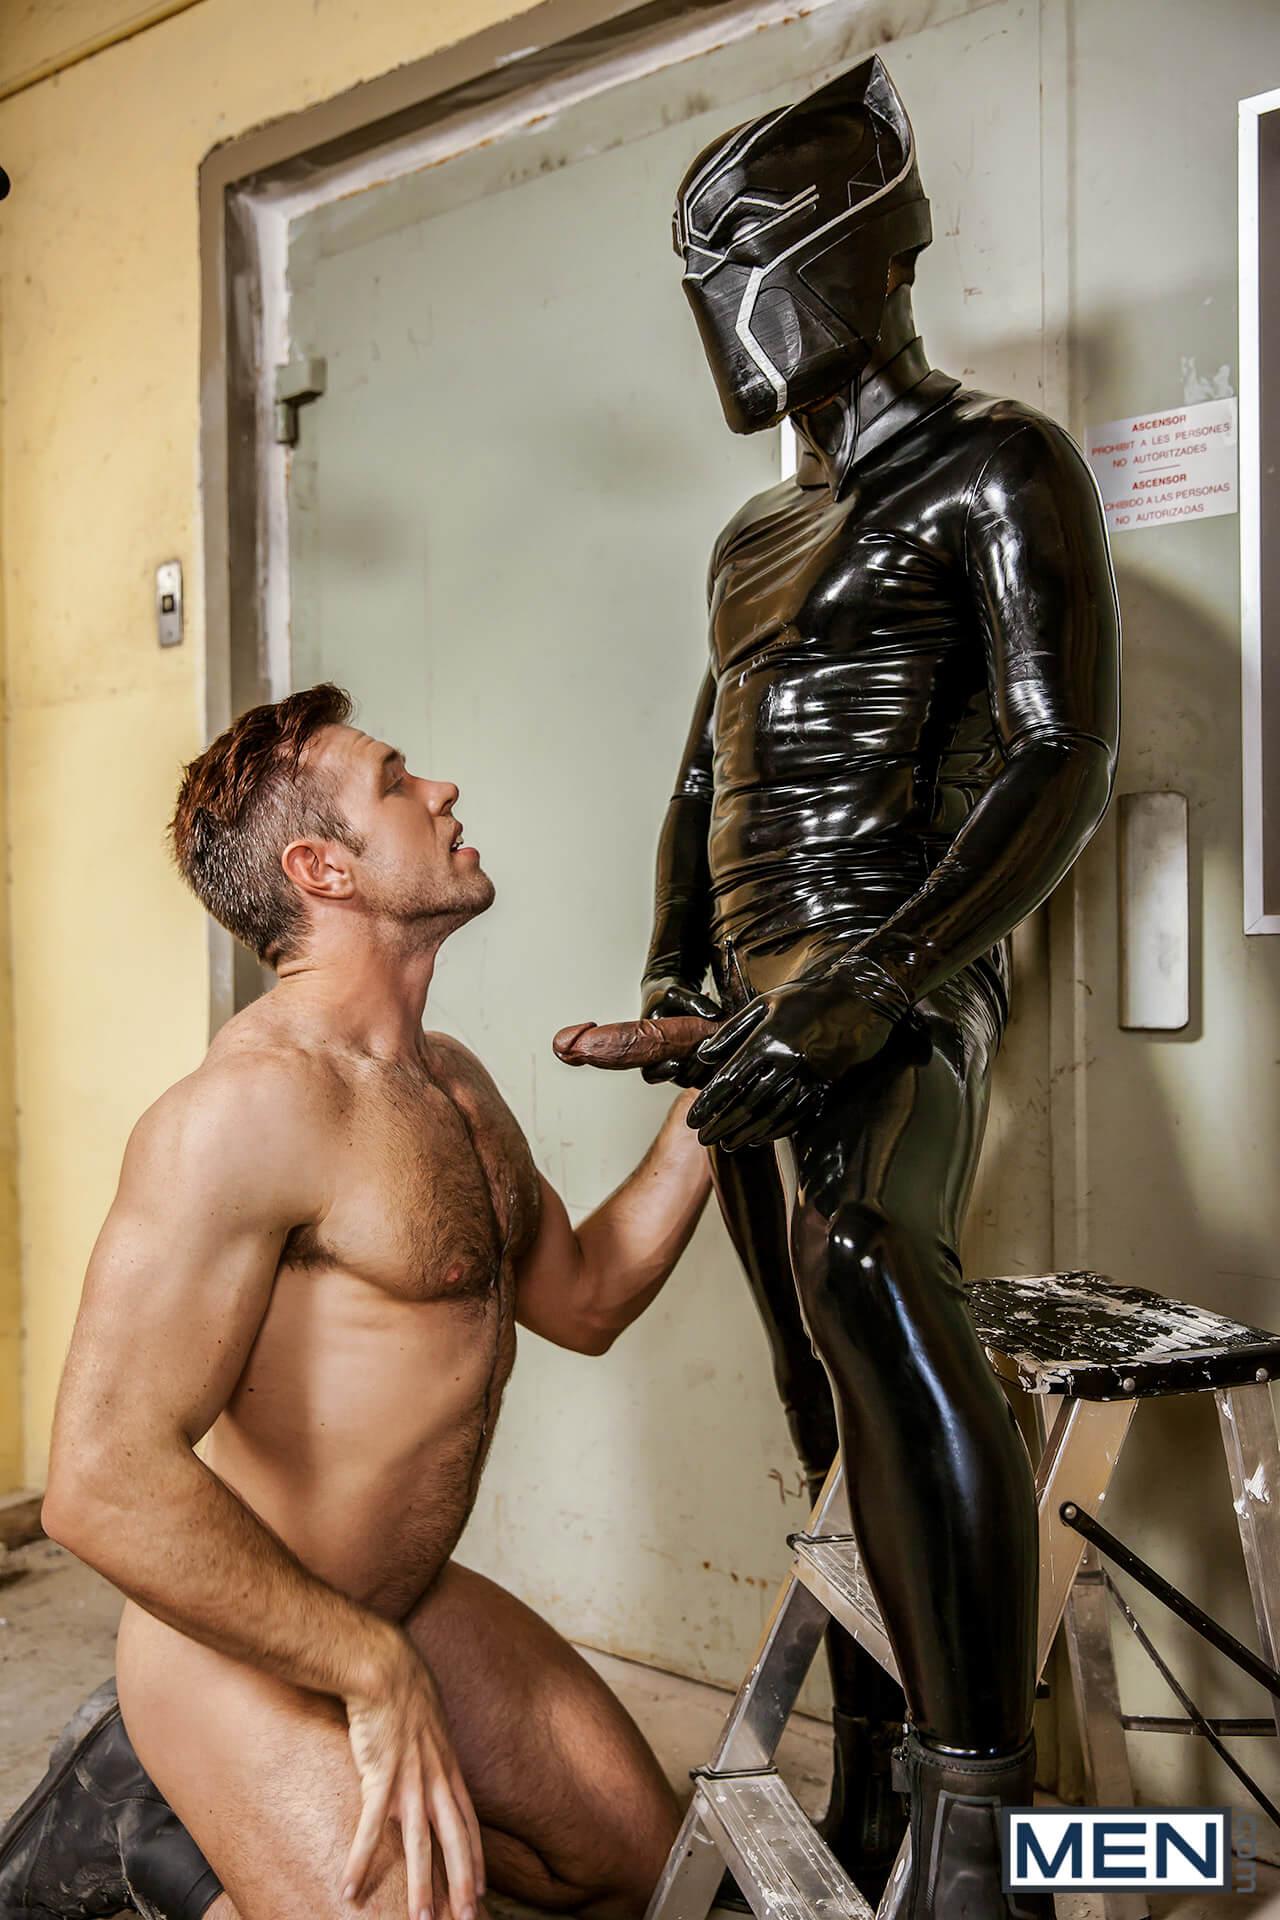 Men Super Gay Hero Captain America A Gay Parody Part Alex Mecum Black Panther Gay Porn Blog Image 3